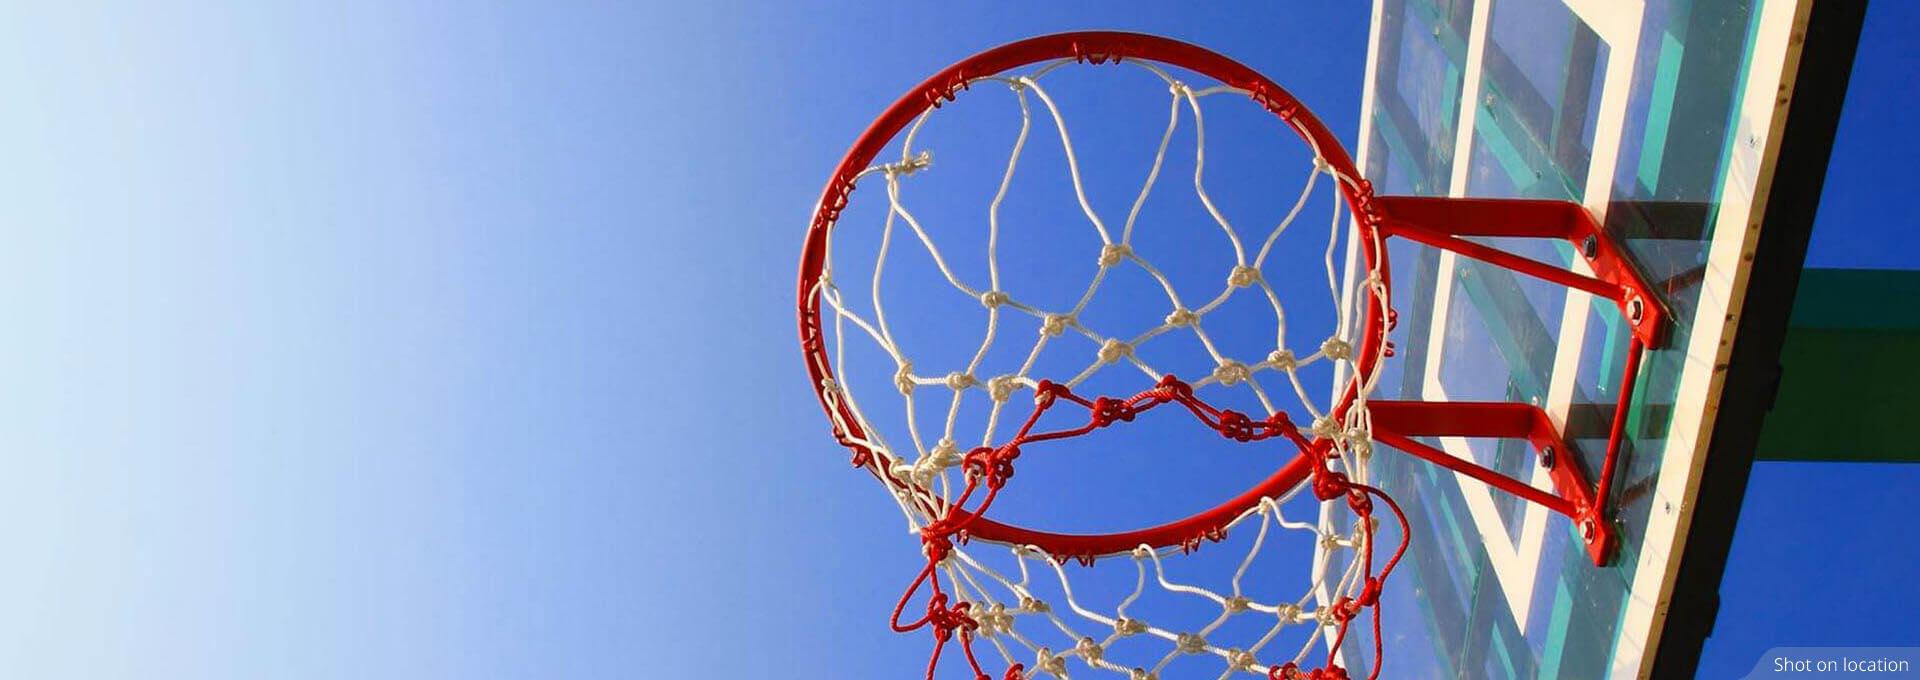 Basket ball Court in Calgary by House of Hiranandani in Devanahalli, Bengaluru